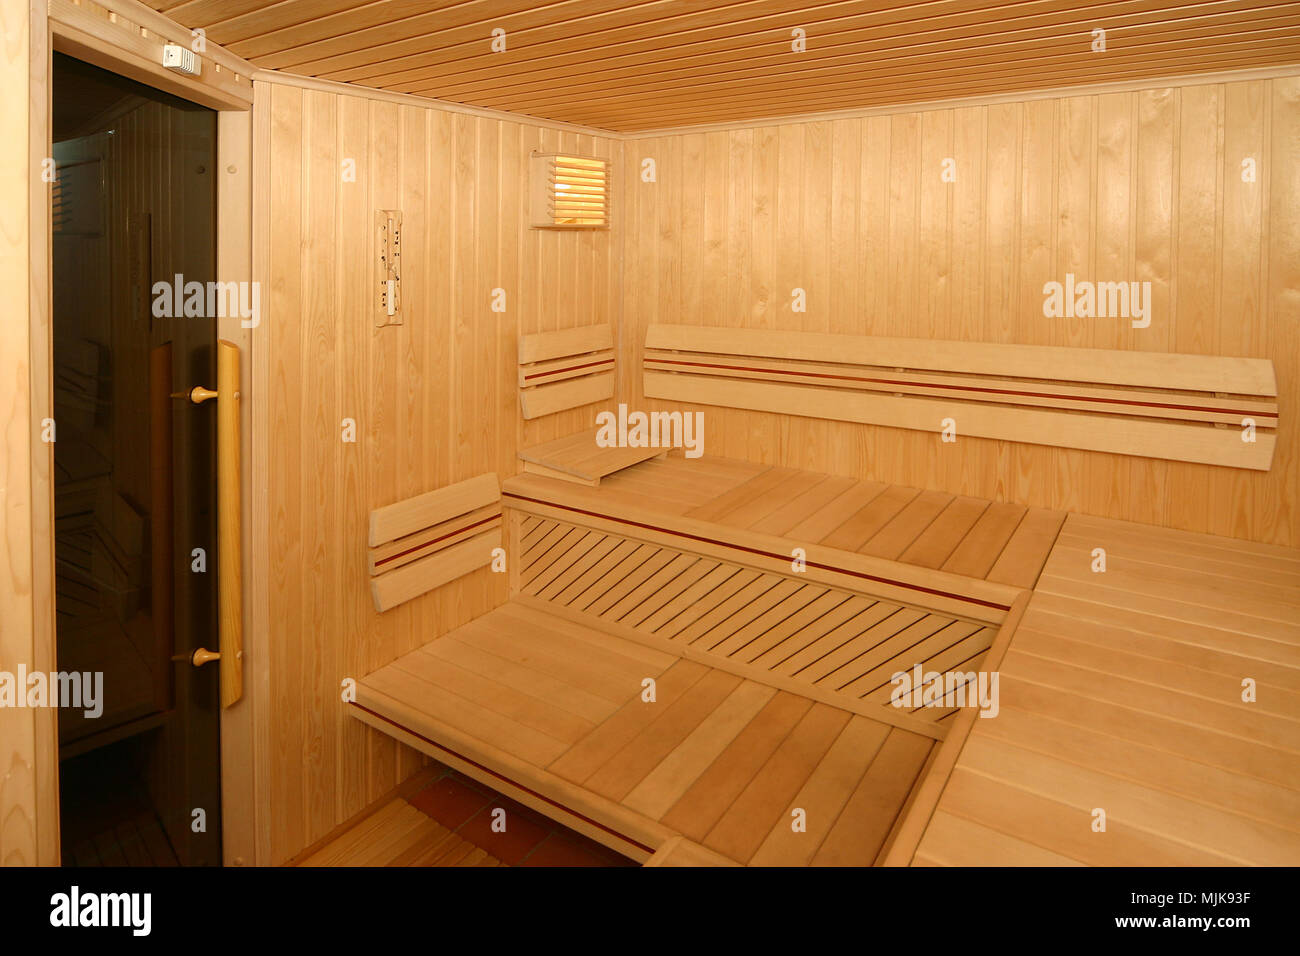 Sauna room with traditional sauna accessories - Stock Image